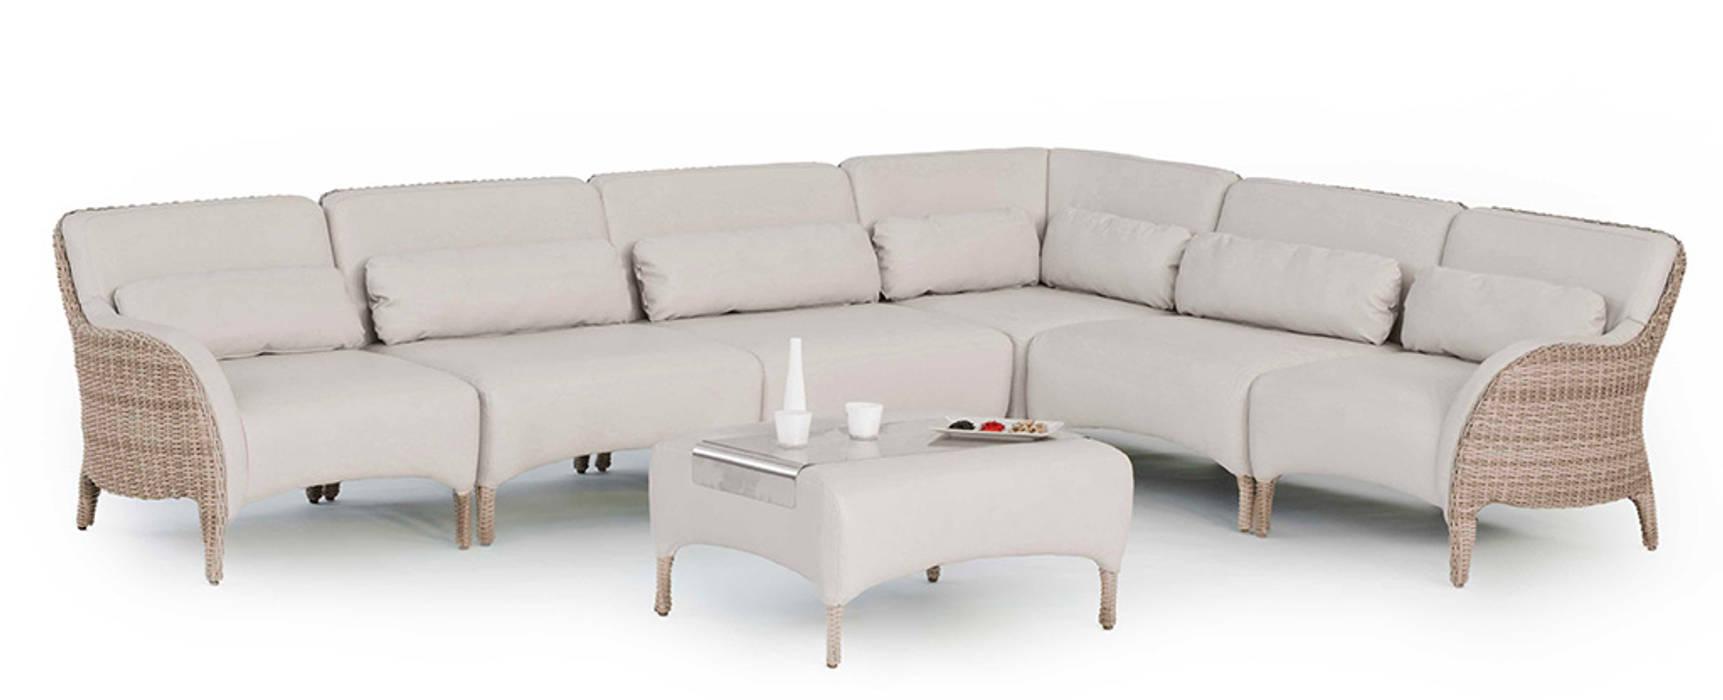 Hevea Garden Furniture Synthetic White